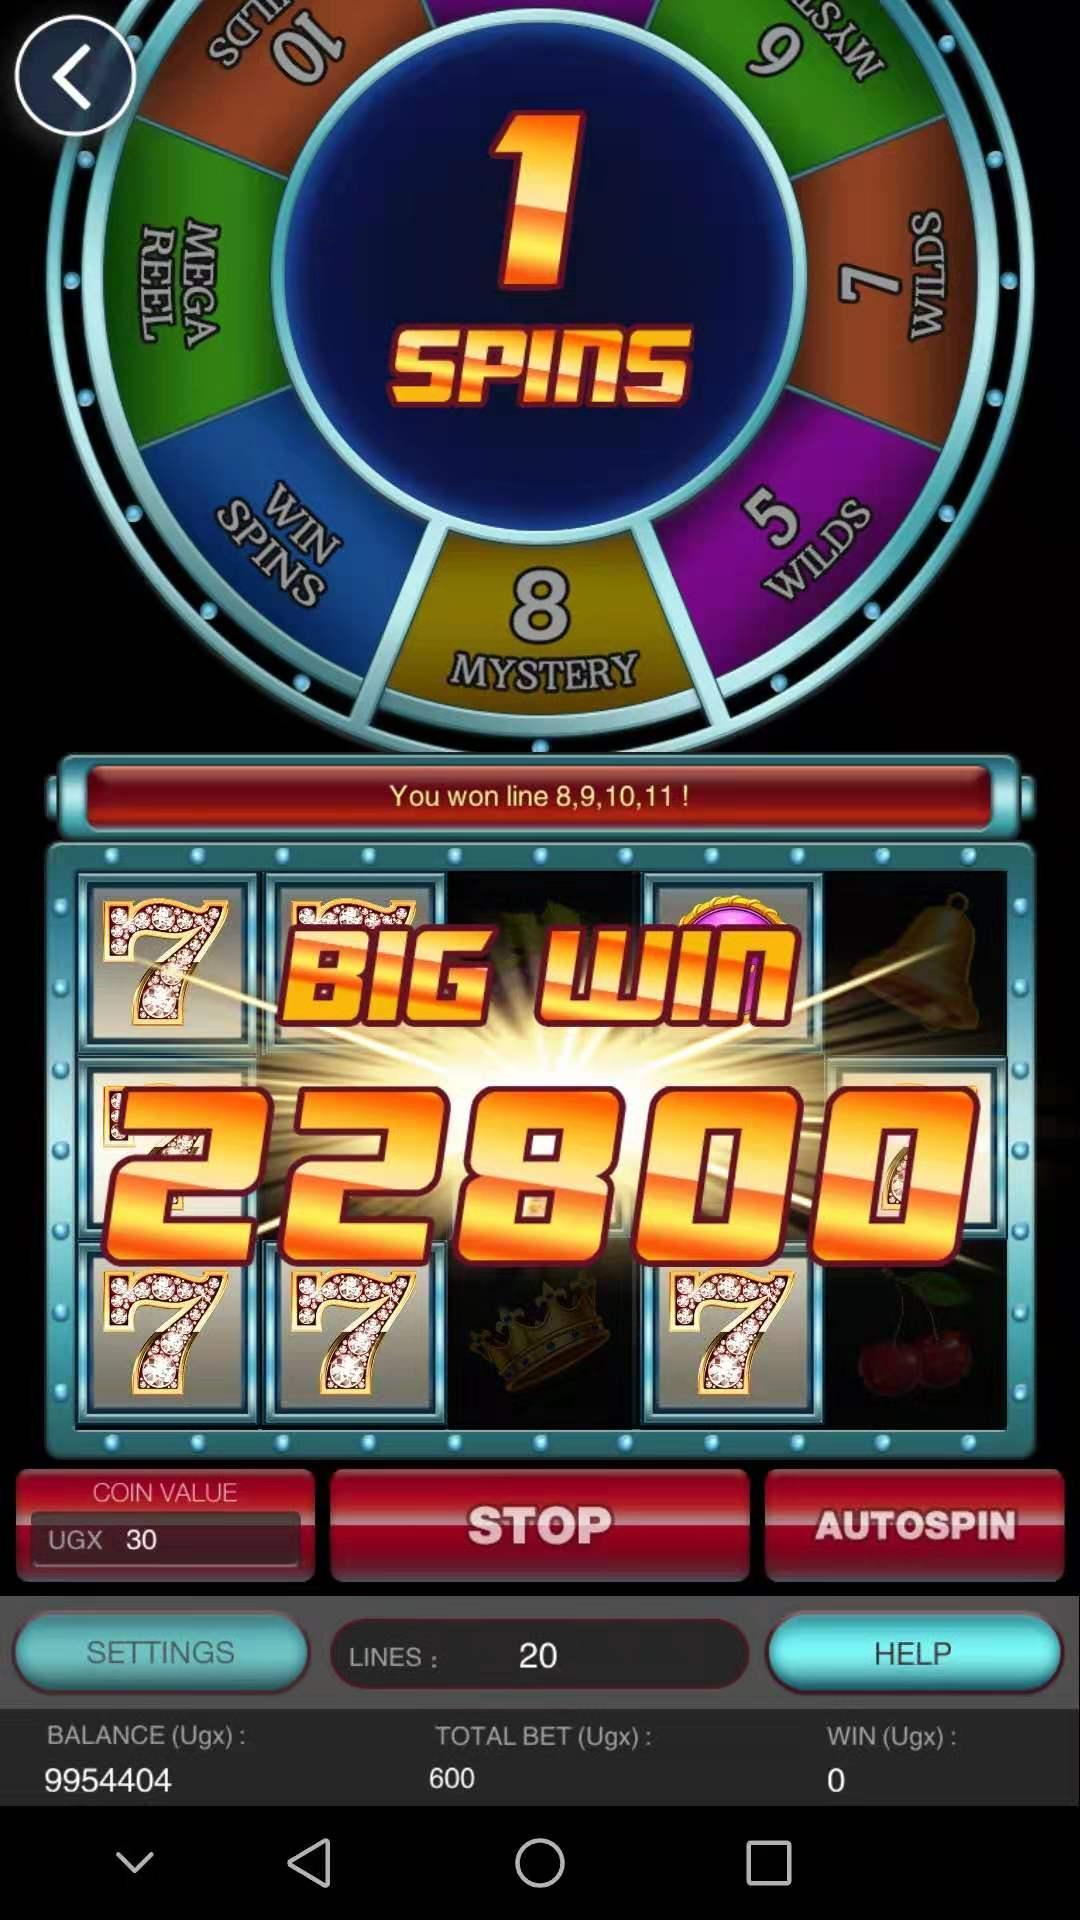 Slotsug Best Online Casino Game In Uganda Pour Android Telechargez L Apk